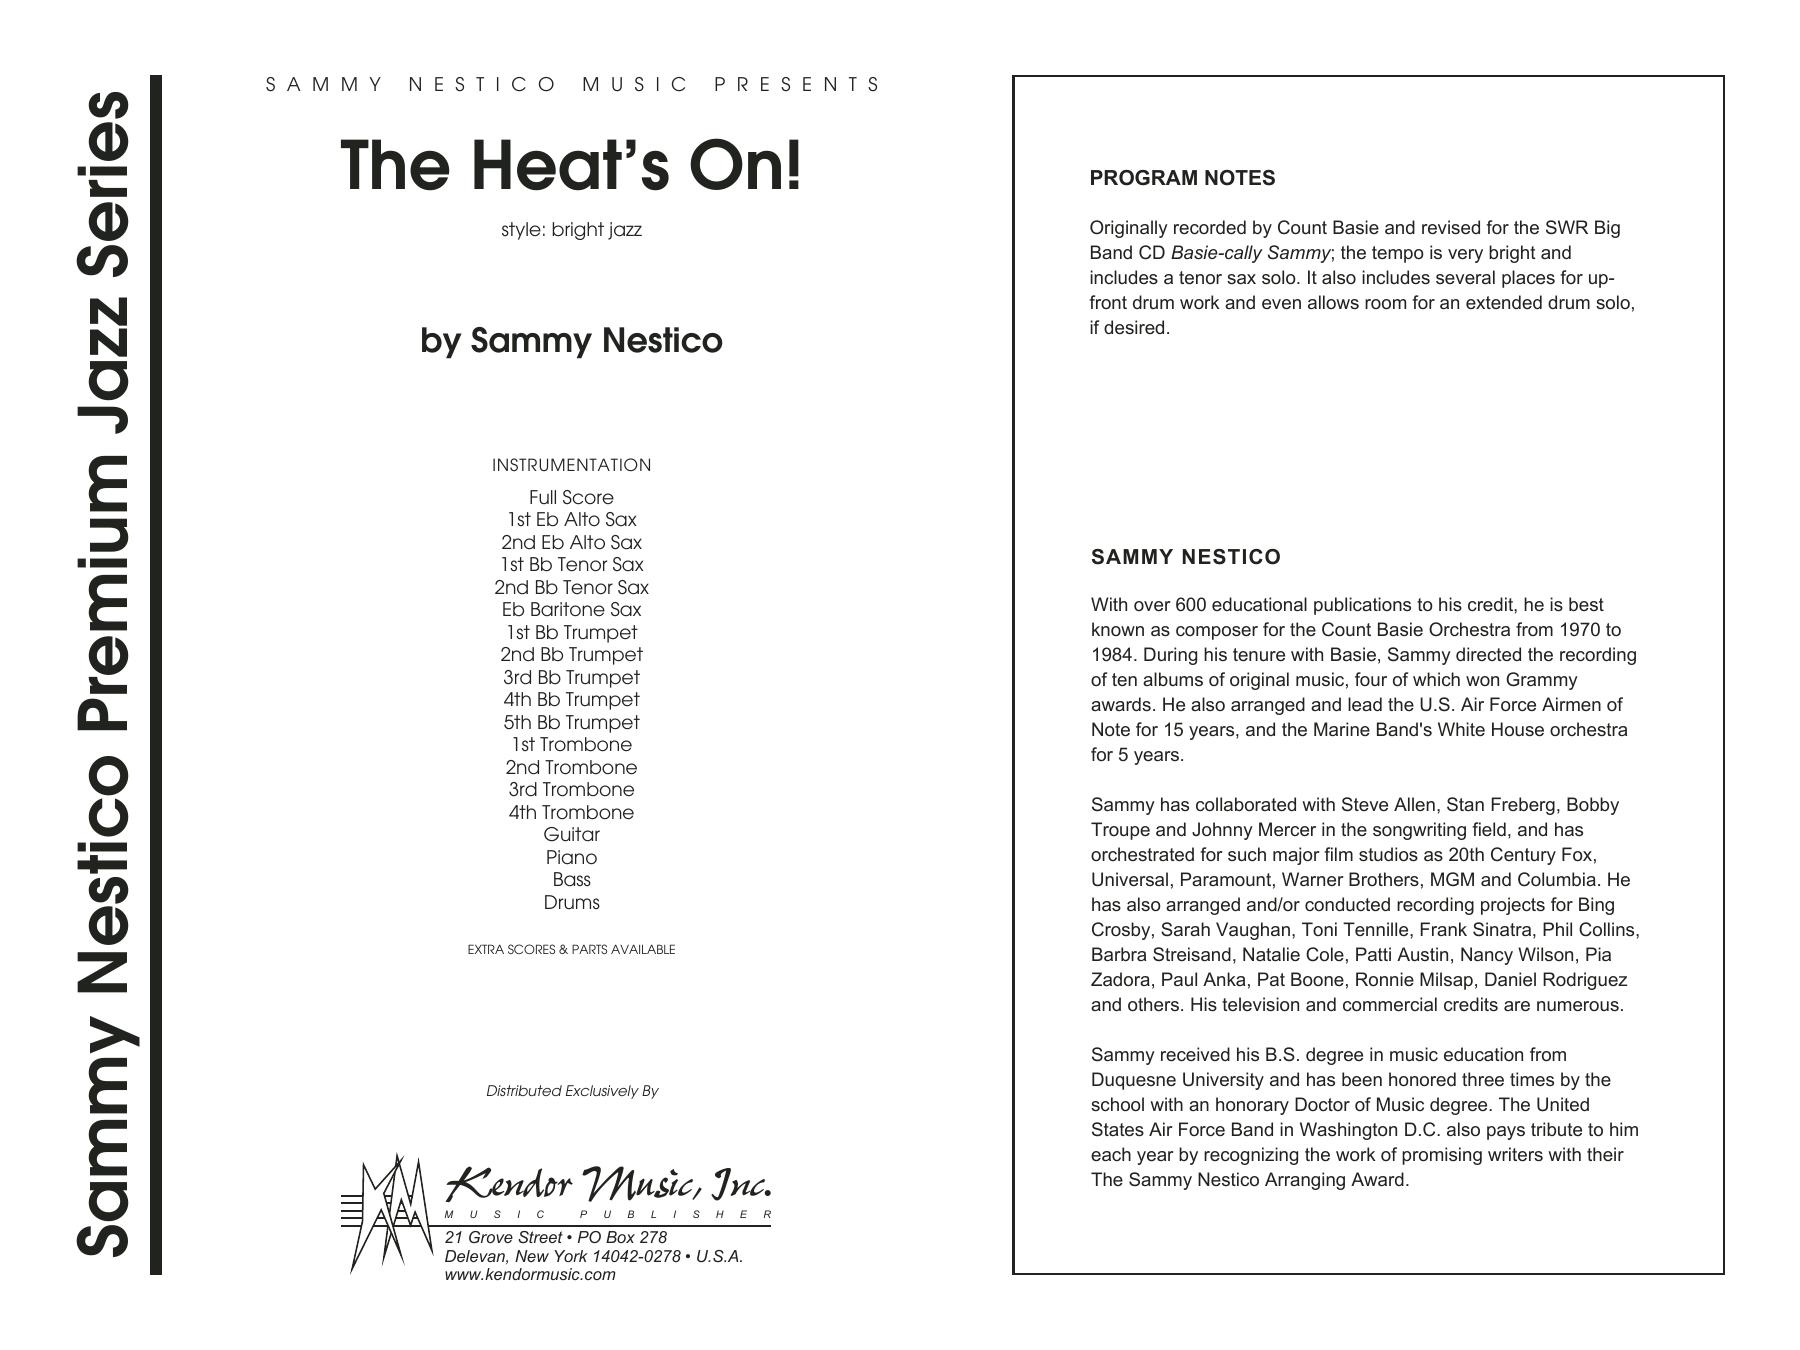 The Heat's On - Full Score Sheet Music